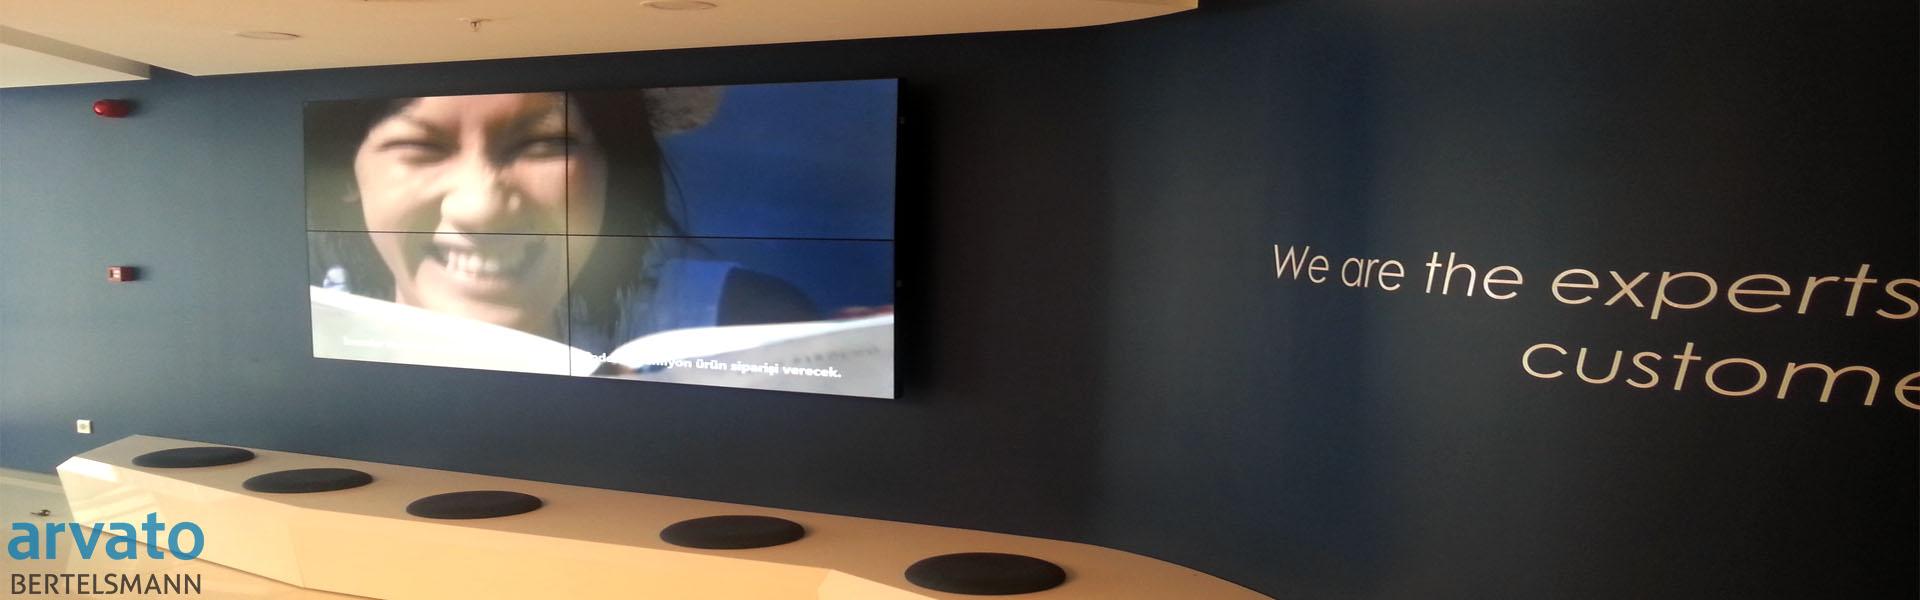 arvato-videowall